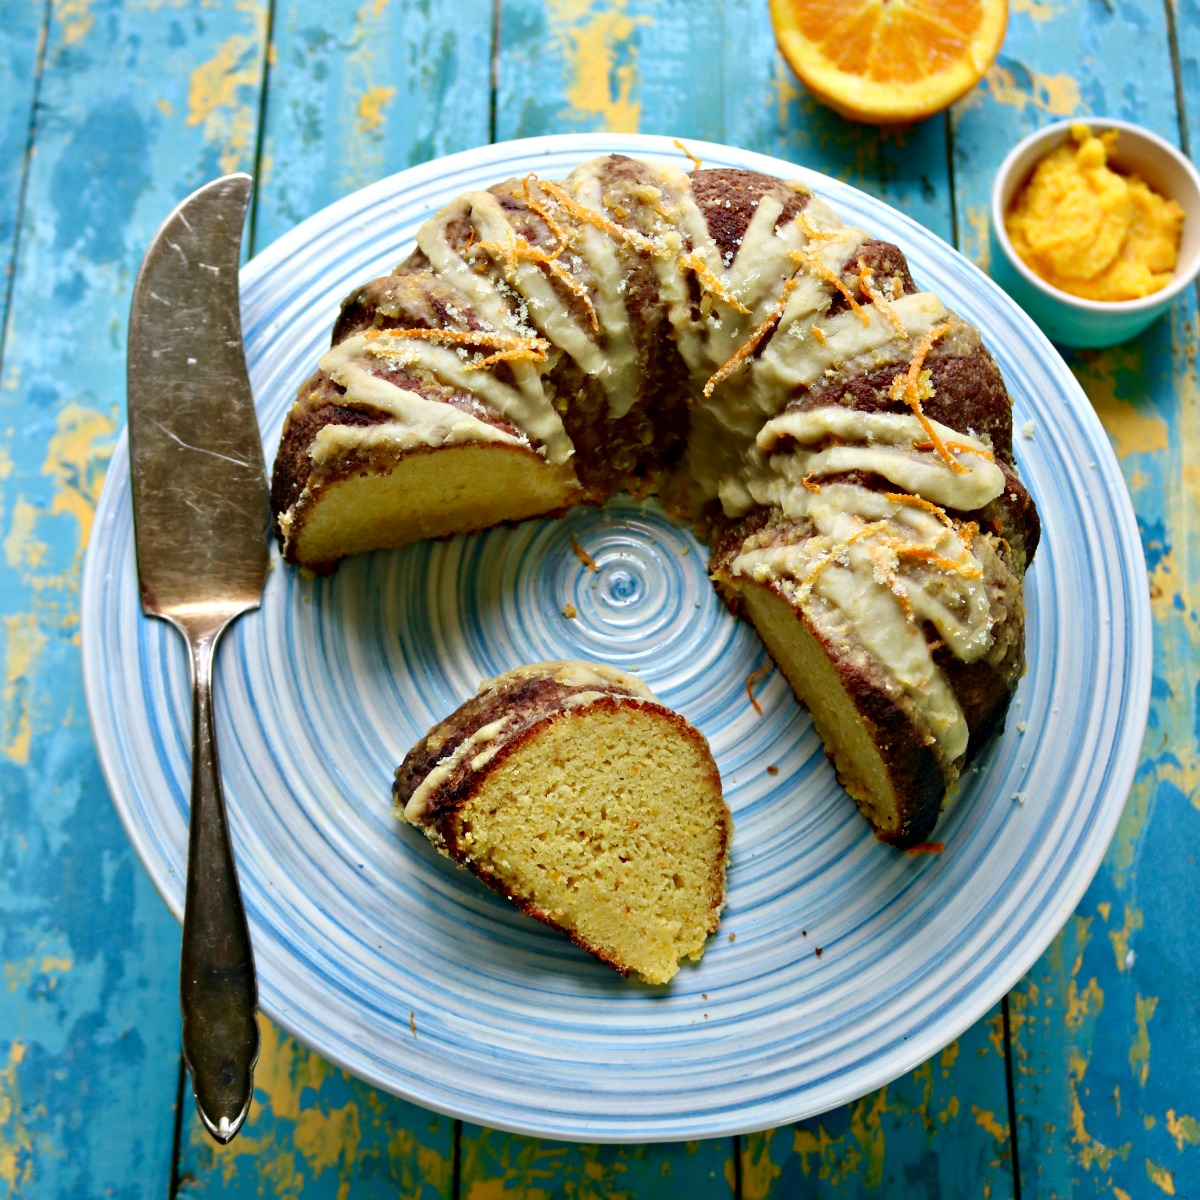 Keto Orange Bundt Cake